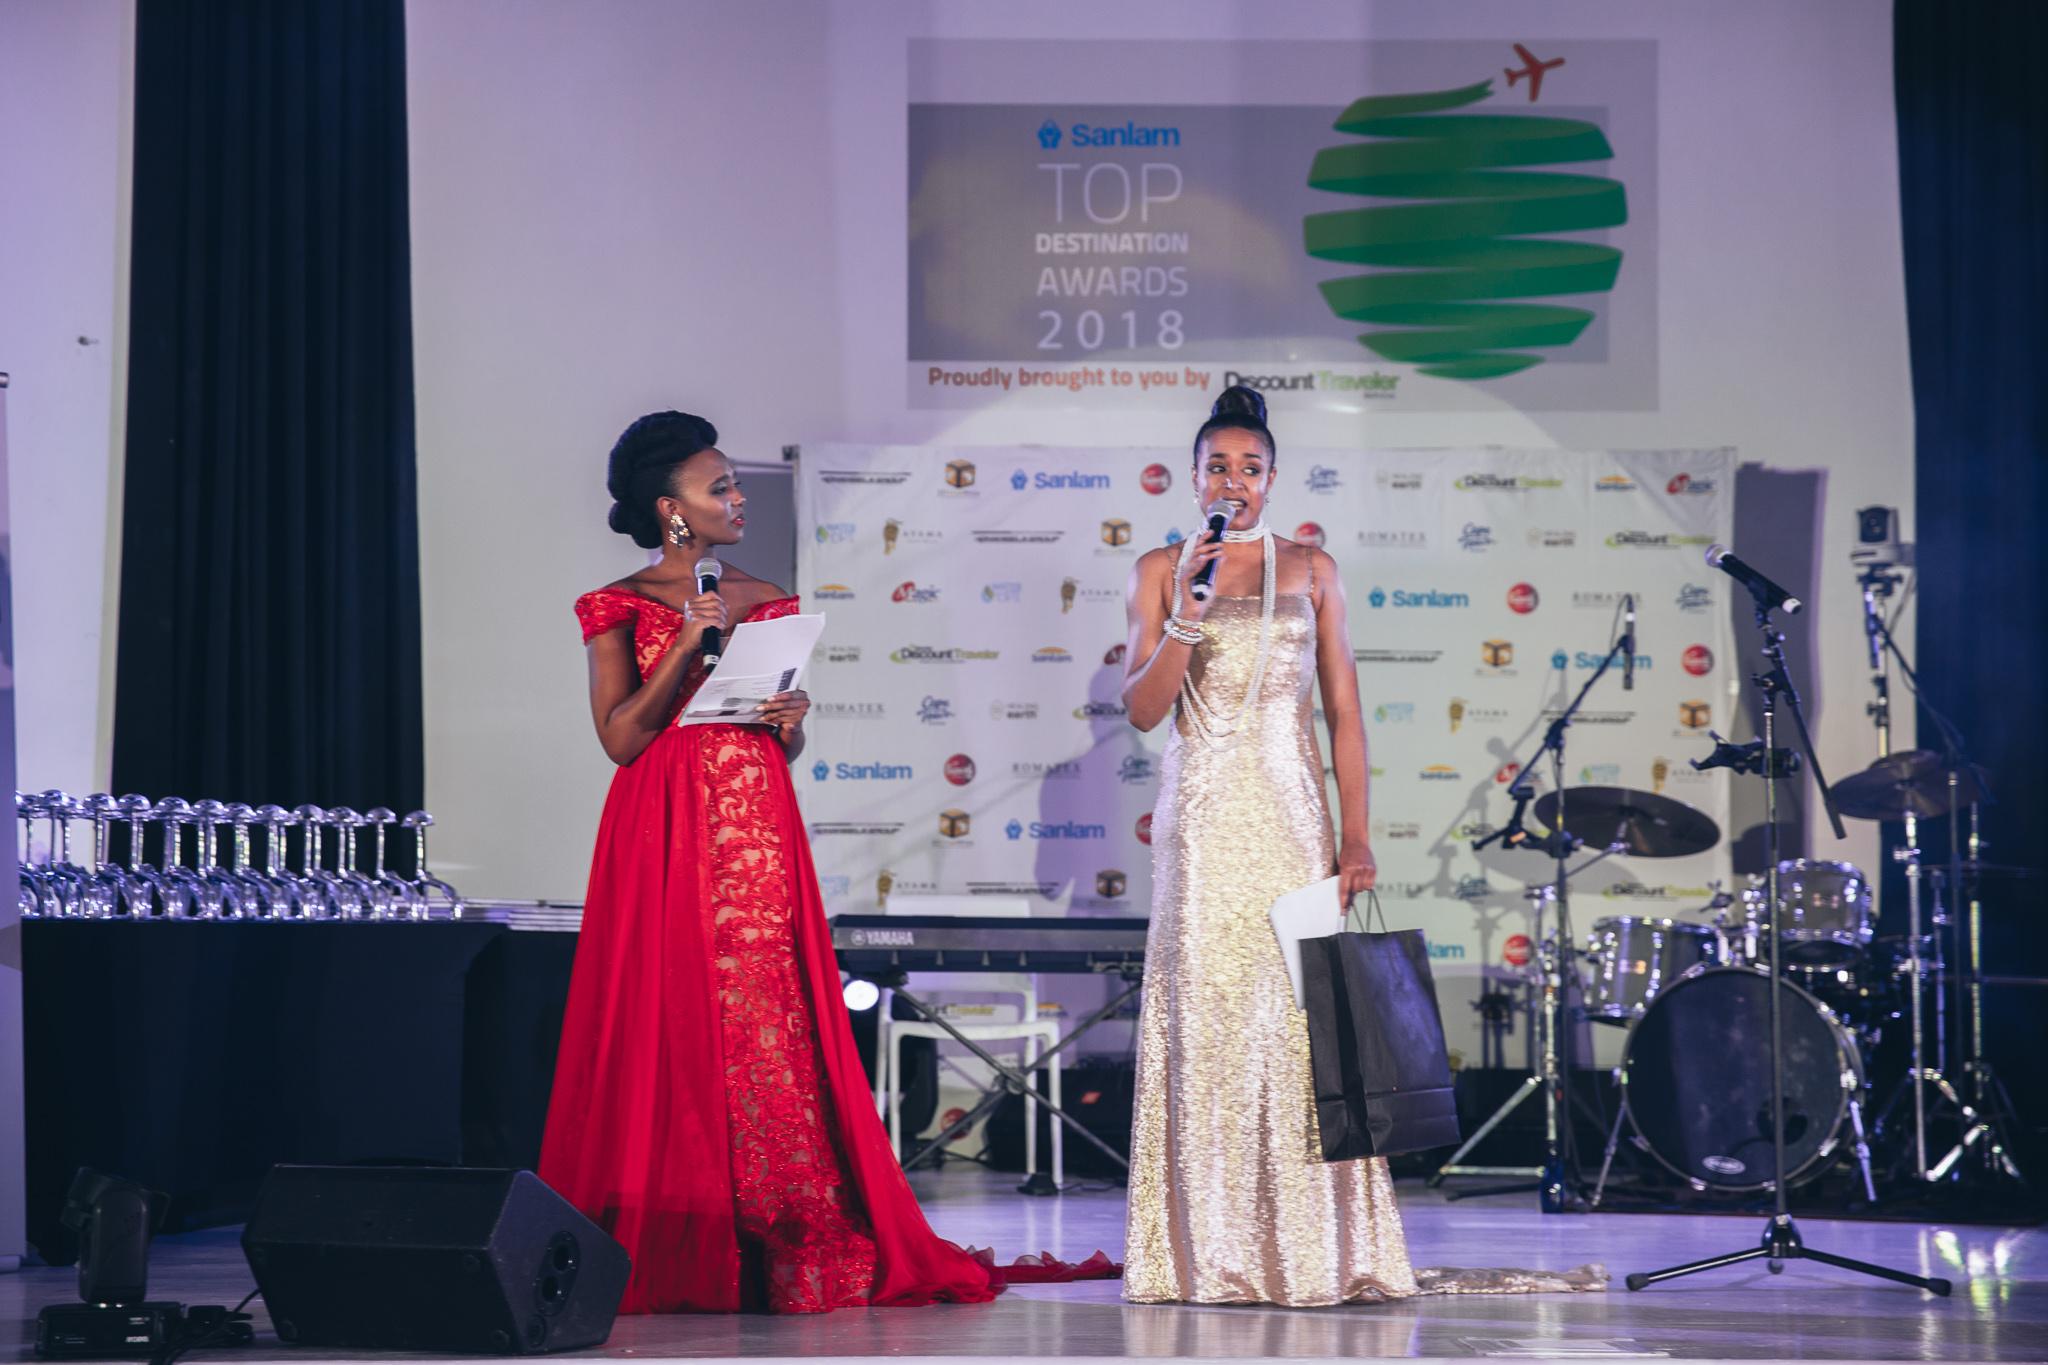 Sanlam-Top-Destination-Awards-42.jpg